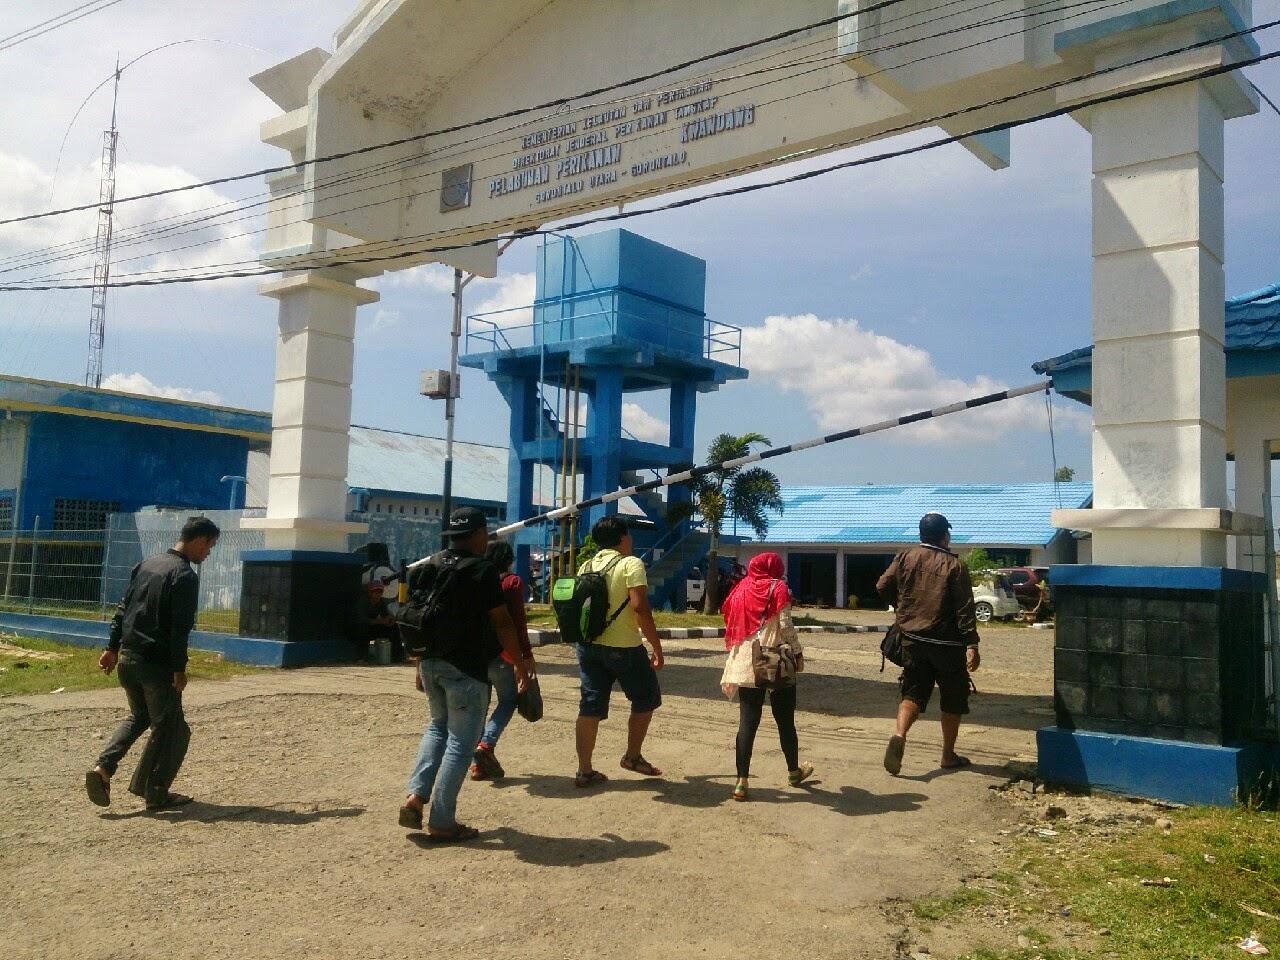 Mei 2015 Kakigatal Gerbang Pelabuhan Kwandang Gorontalo Utara Pantai Pasir